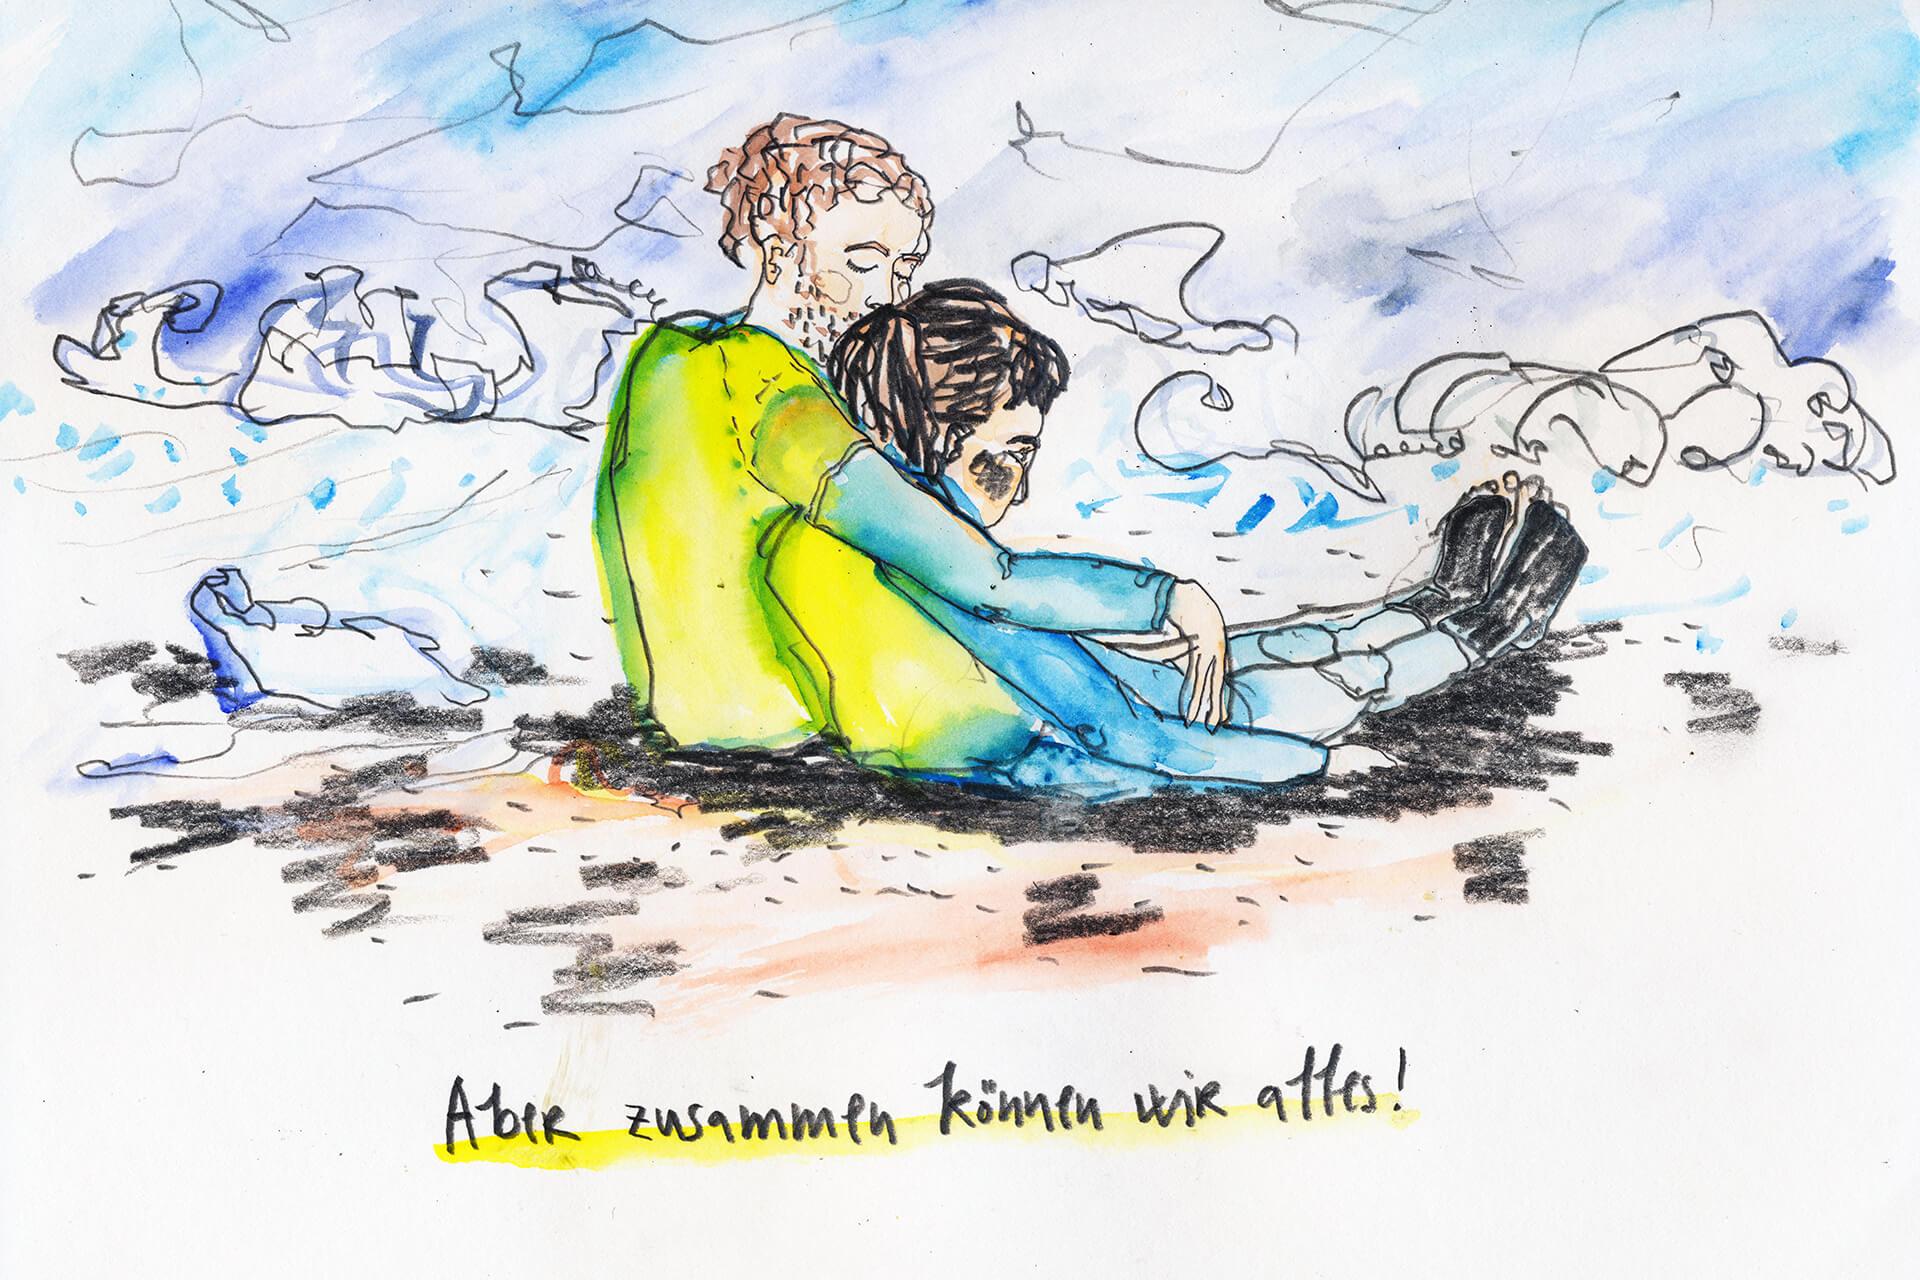 Matrosenhunde, Illustration Berlin, Text, Paar, Romantik, Zeichnung, Surfen, Brandung, Zusammen, Wochekalender, Mann, Frau, couple, Liebe, love